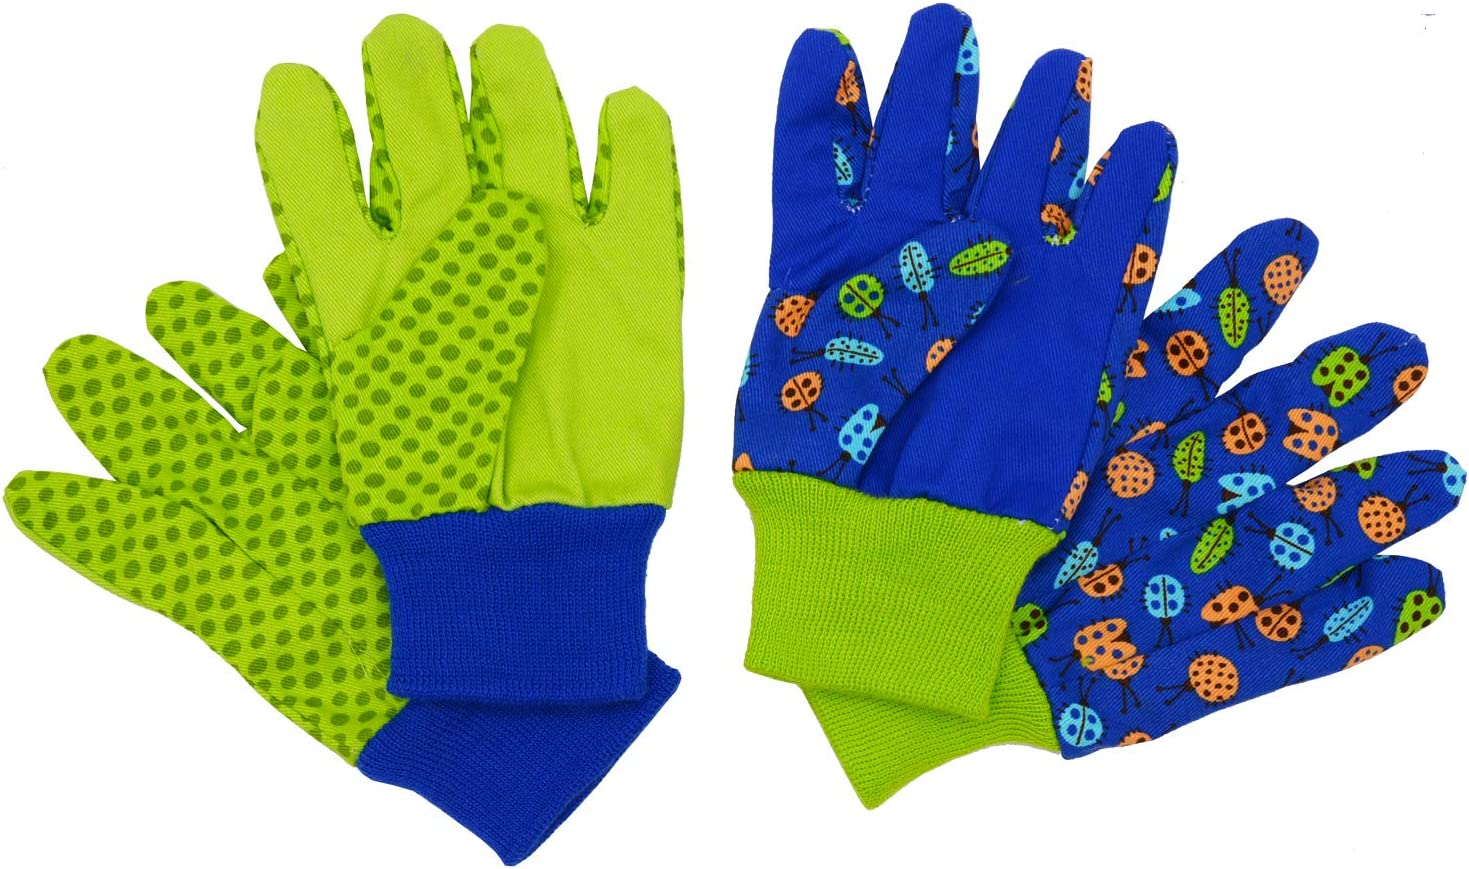 Kids Gardening gloves for age 5-6, age 7-8, 2 Pairs Cotton Garden Working Gloves for girls boys, Dot & Butterfly & Ladybird Print (Medium (age 7-8), Green (ladybird+ dot))